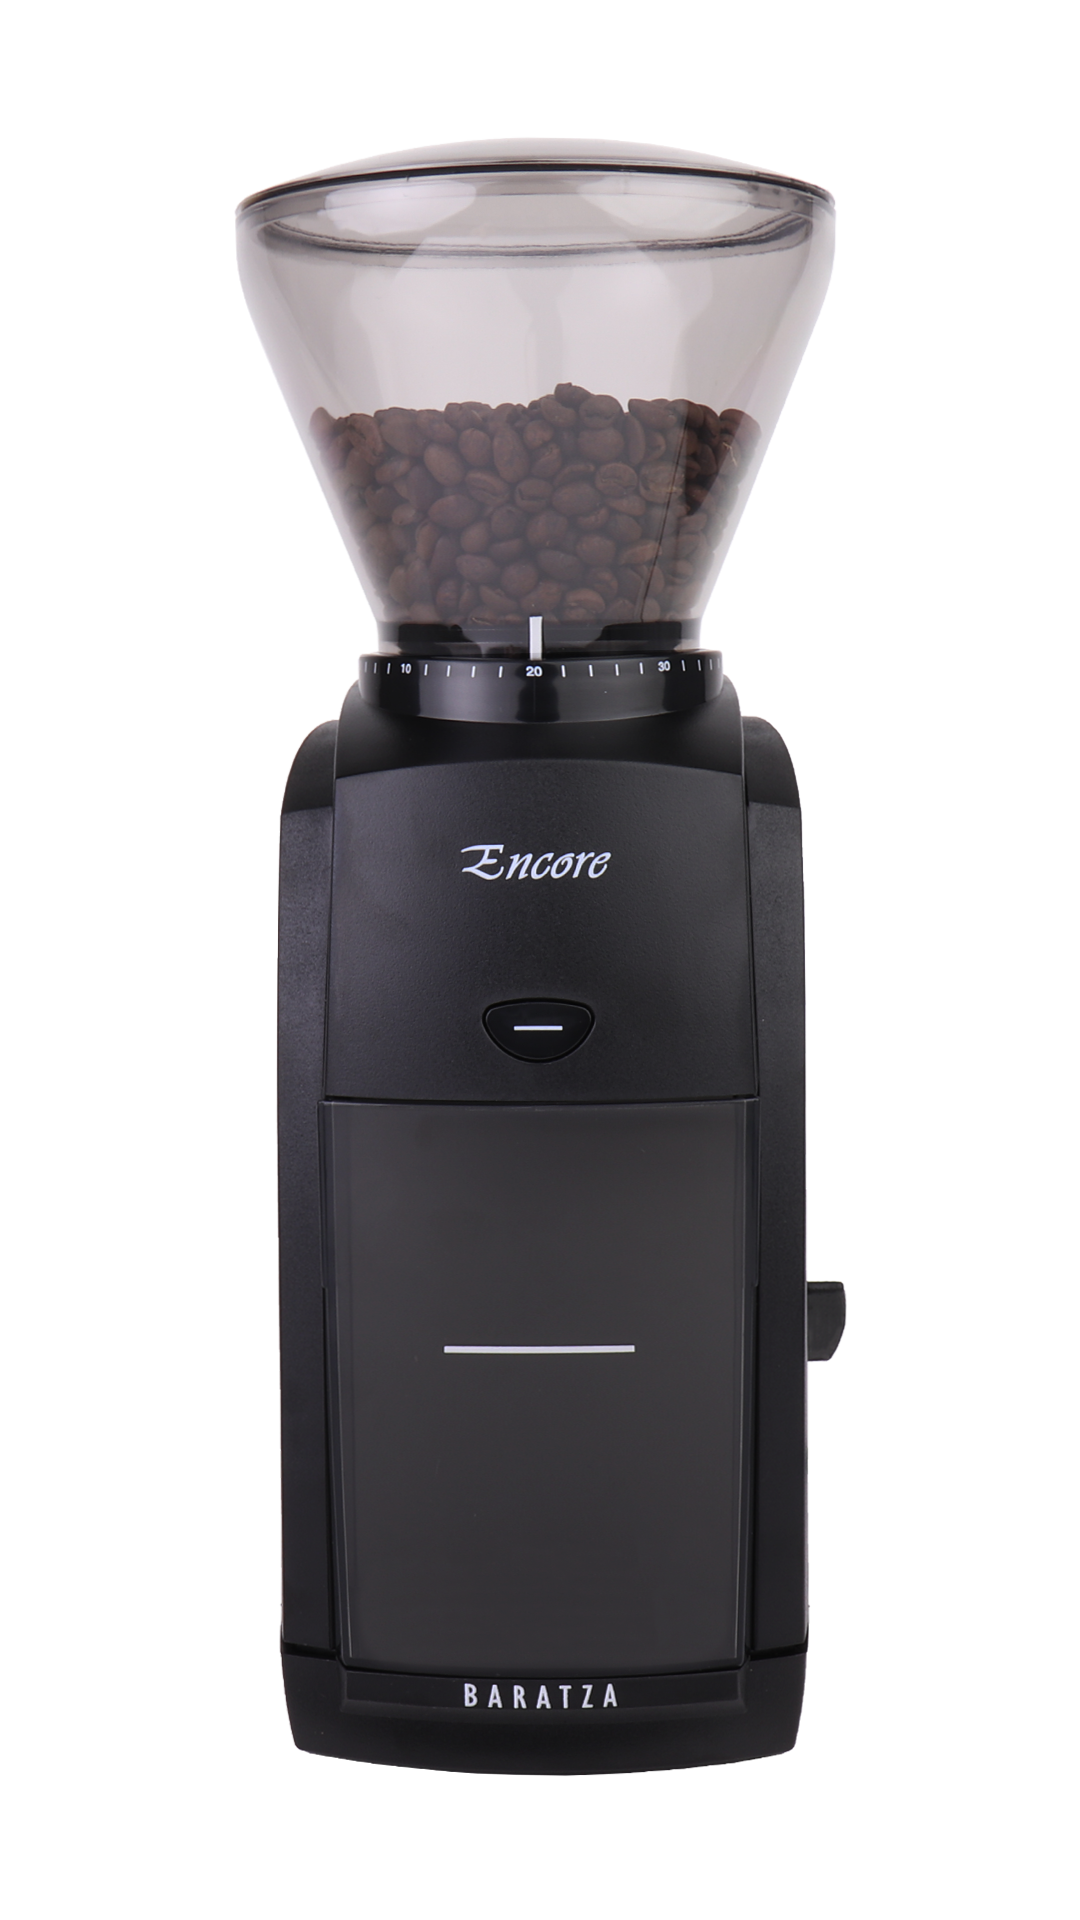 Baratza Encore Conical Burr Grinder in 2020 Coffee